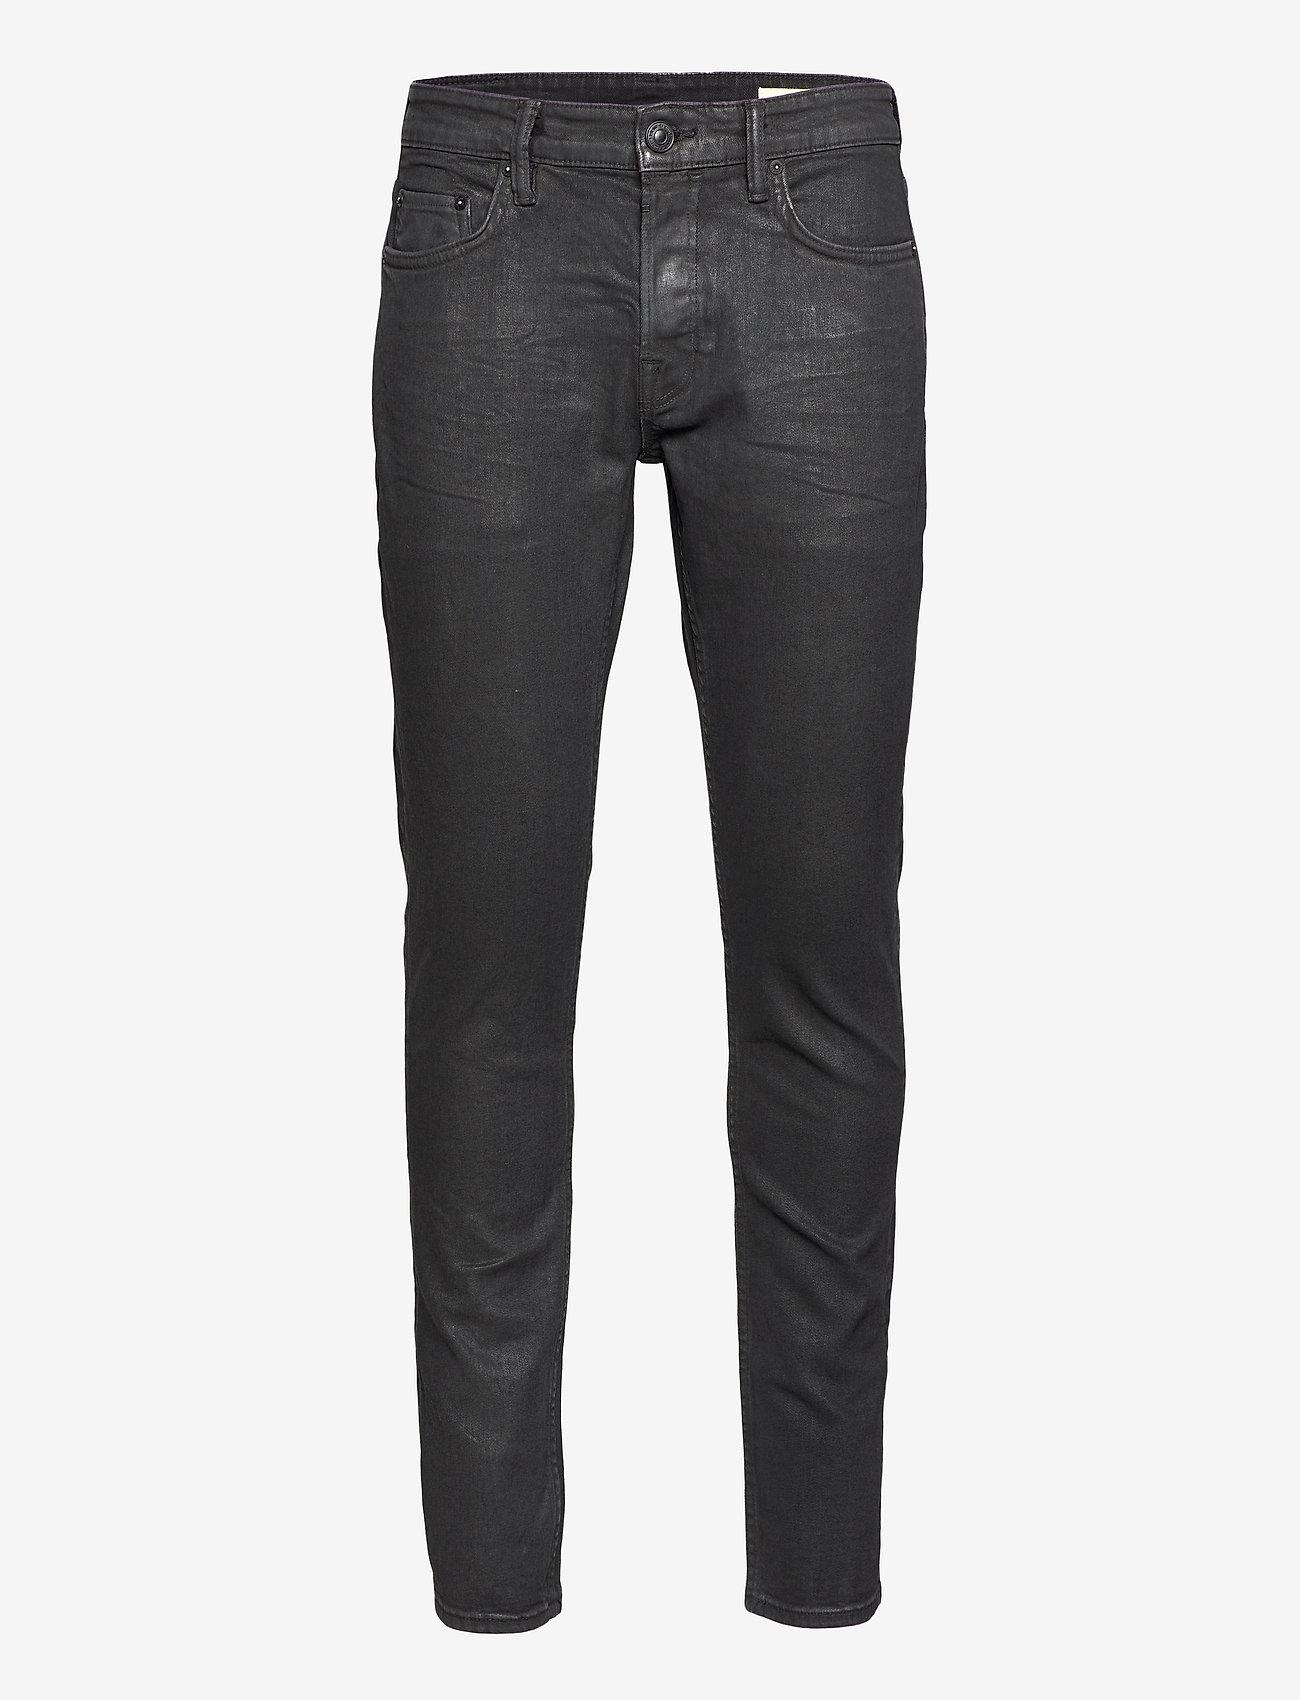 AllSaints - REX - regular jeans - black - 0